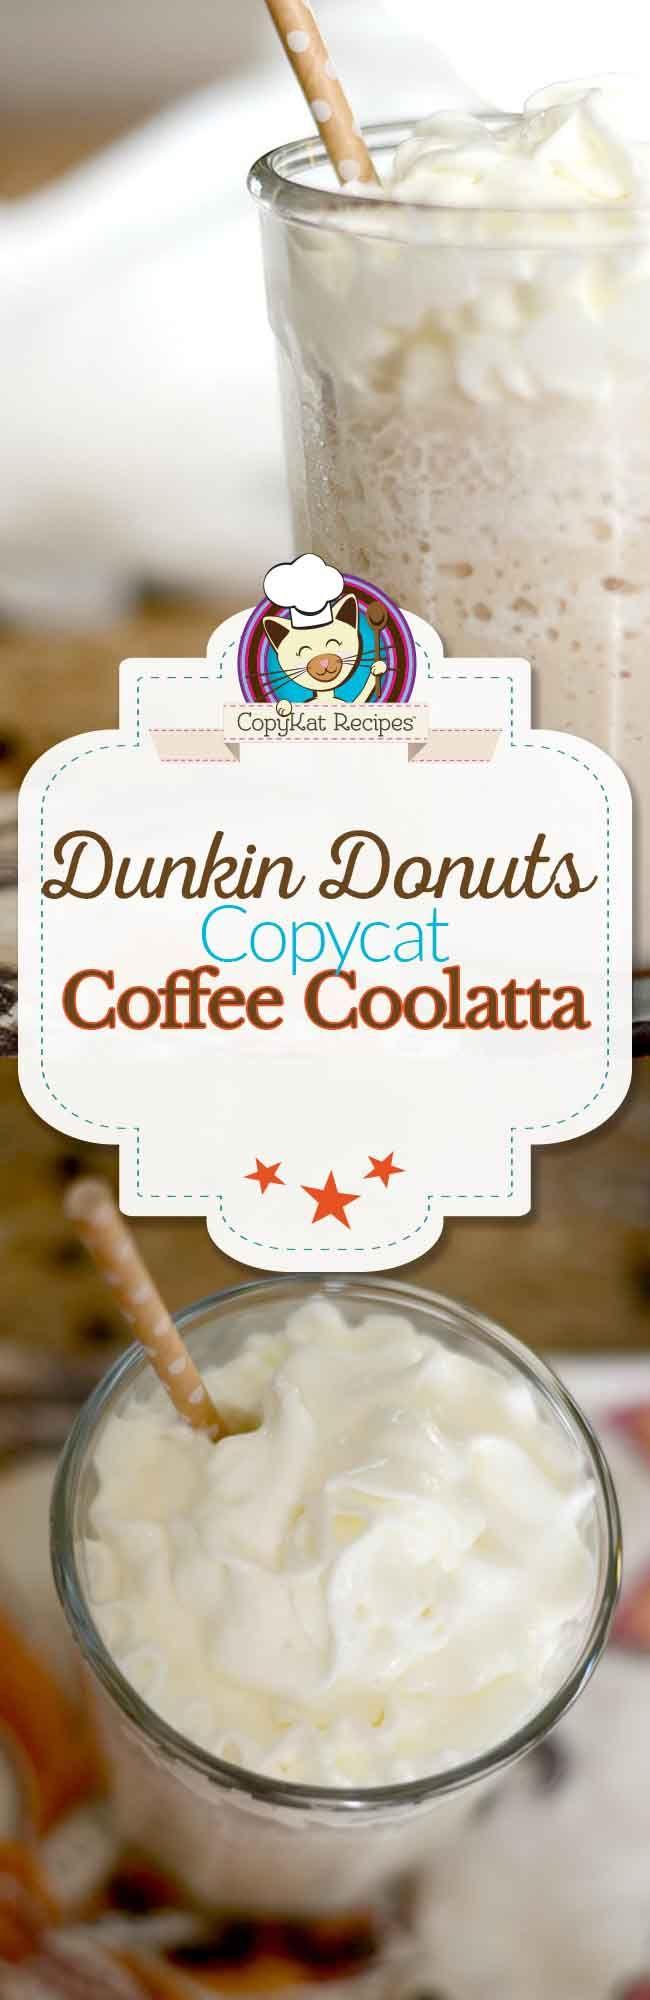 Best 20+ Dunkin donuts coffee ideas on Pinterest | Starbucks ...